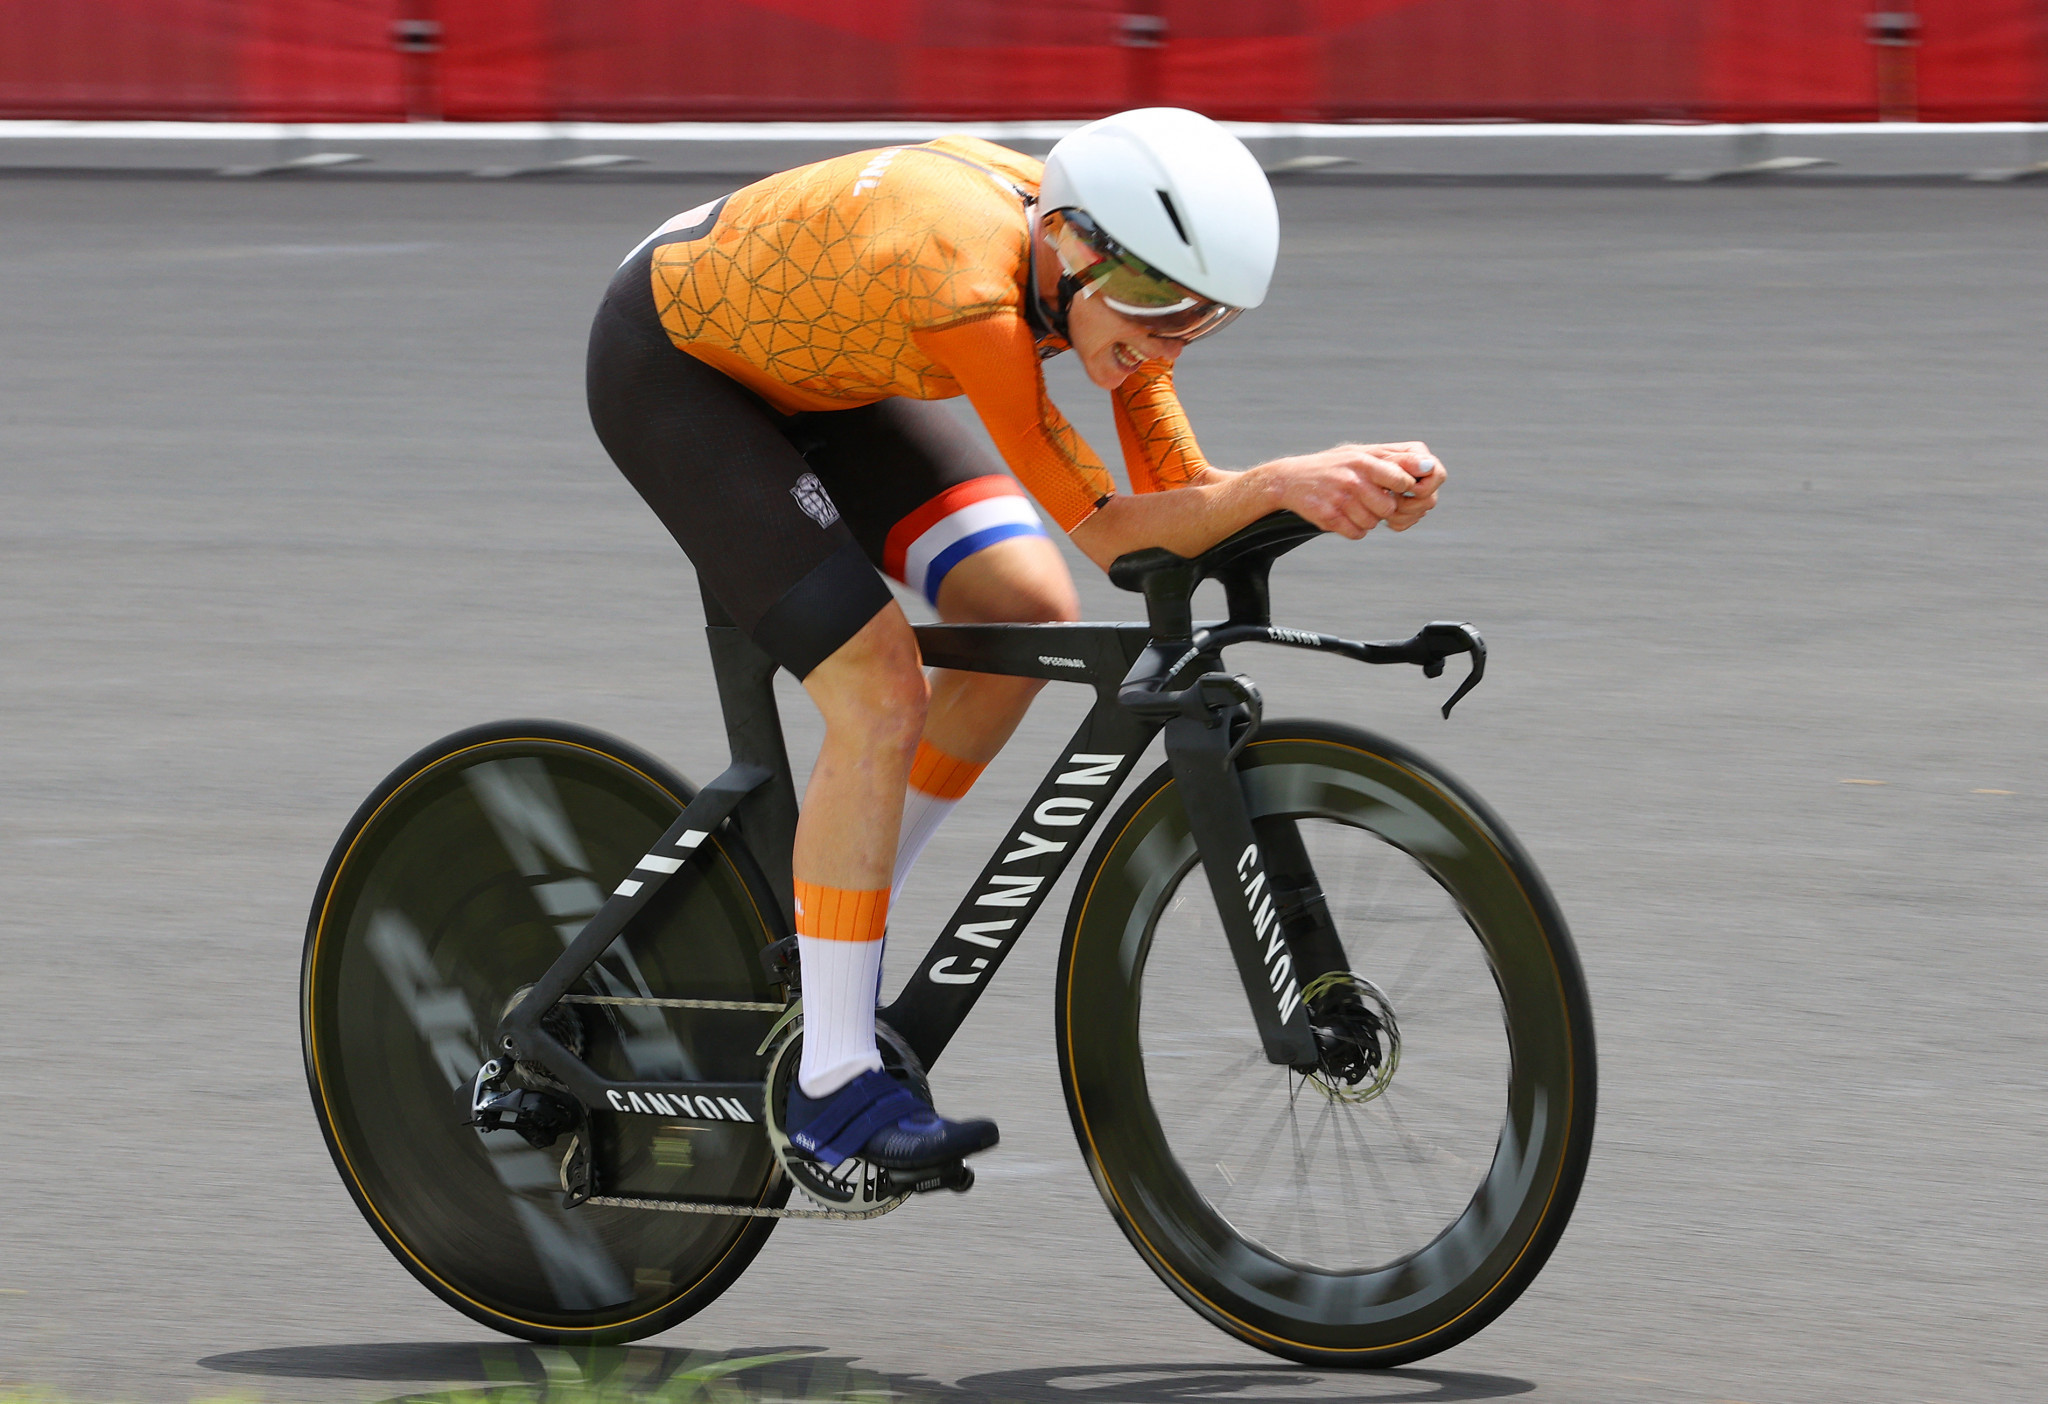 Van Vleuten wins women's individual time trial gold at Tokyo 2020 after dominant display